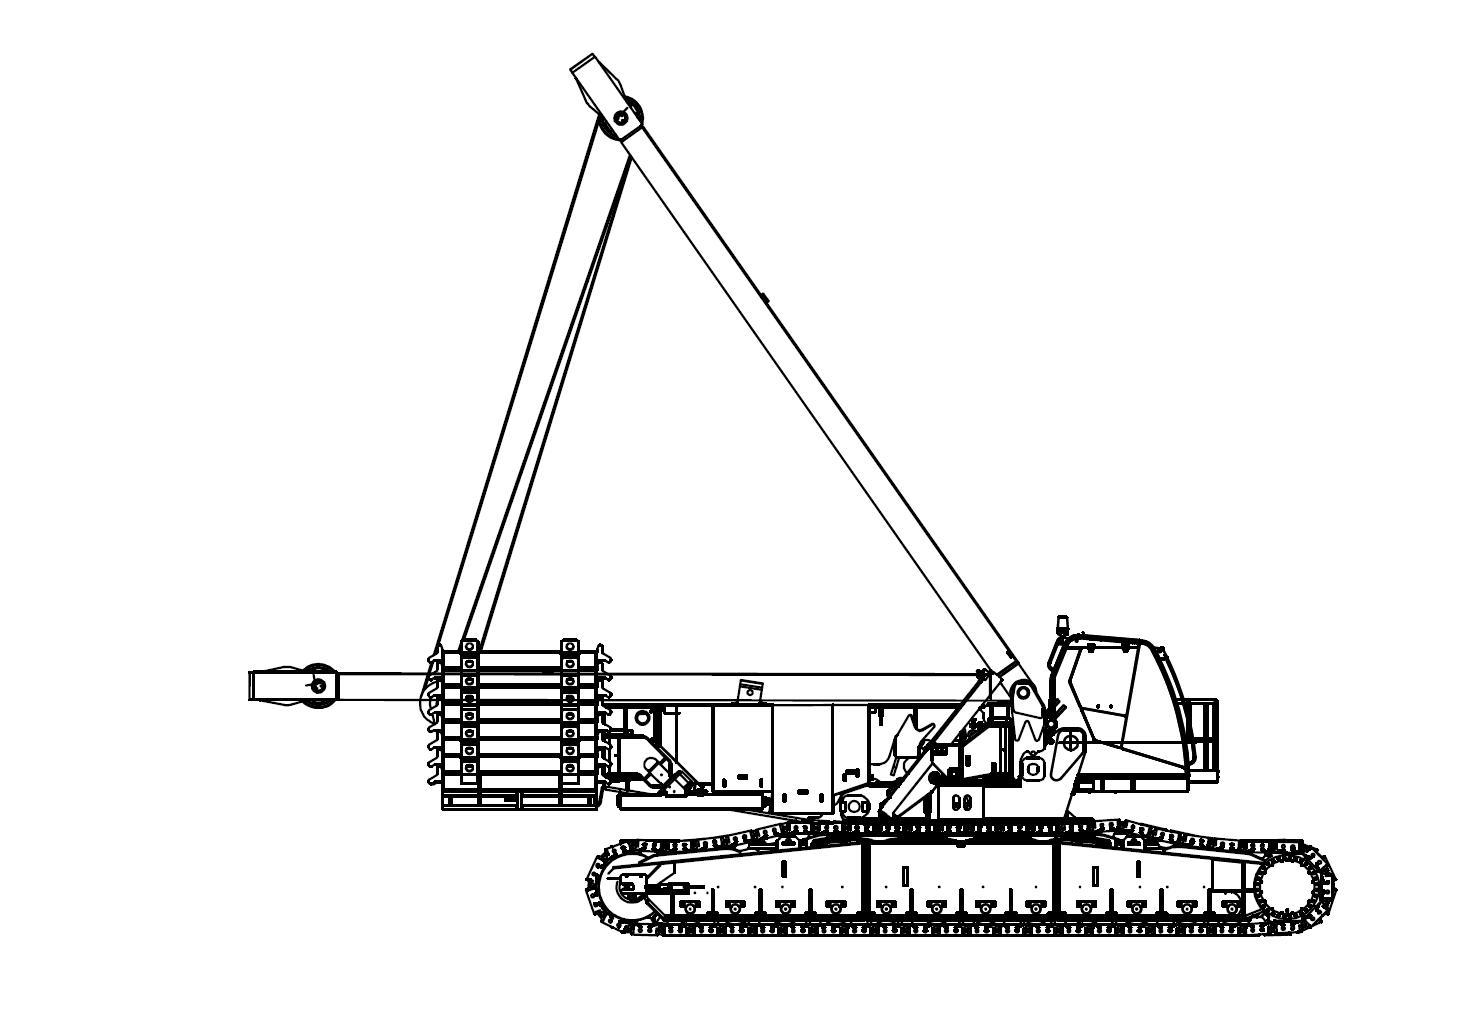 Mobile Crane Cad Block : Tower crane autocad block free download programs